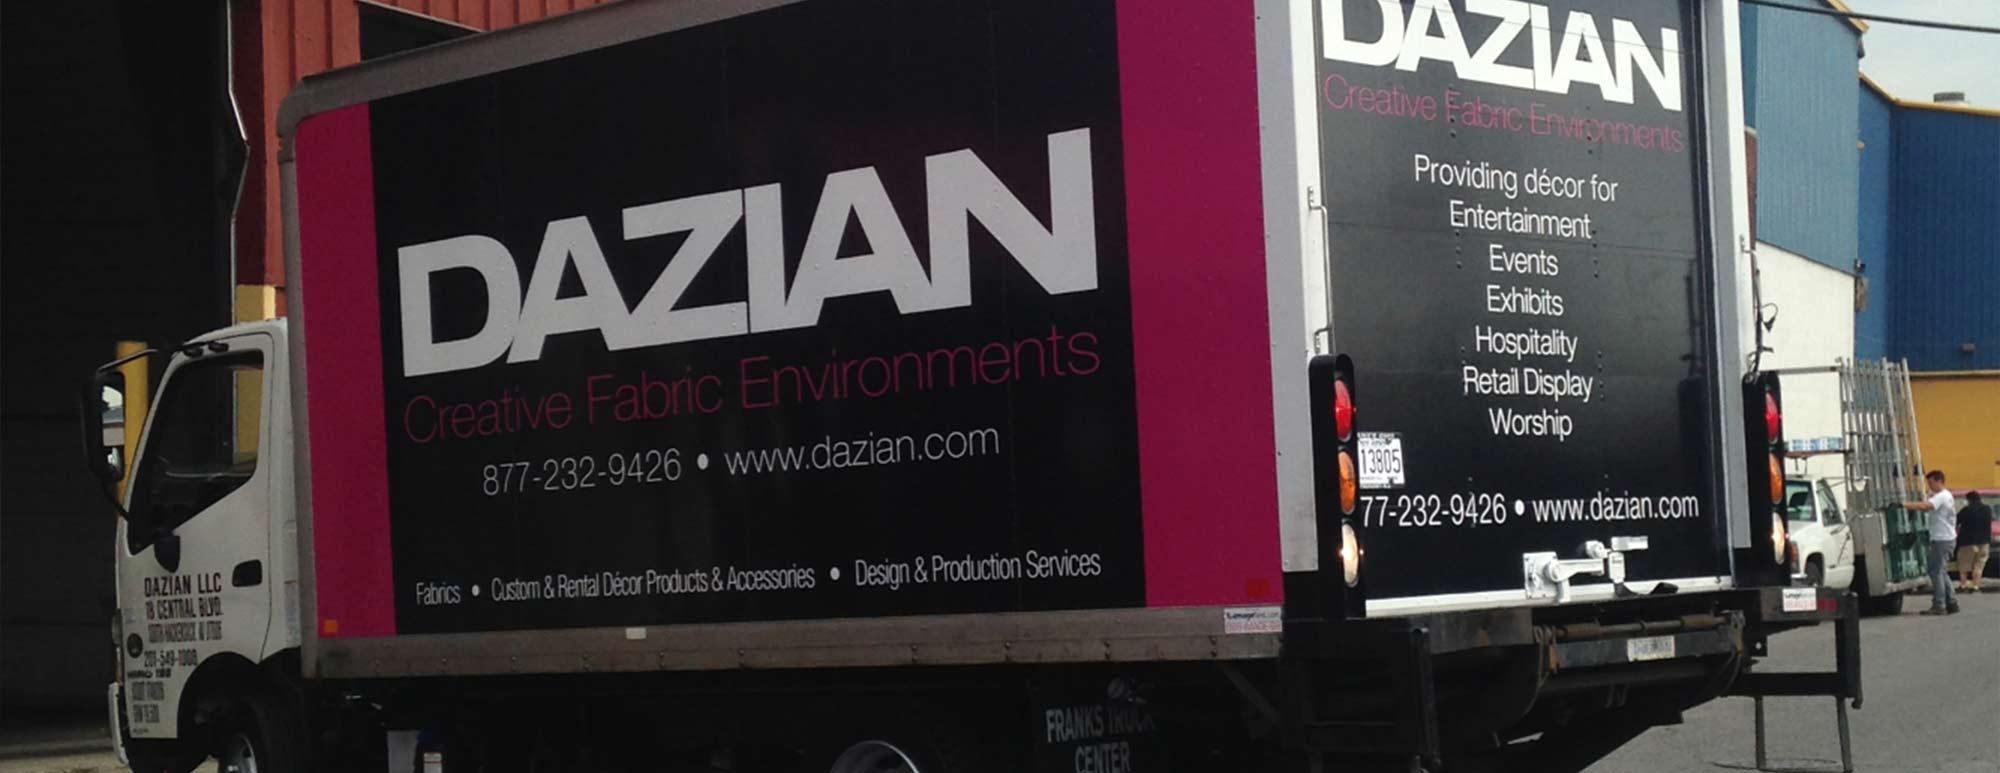 Shop Custom Printed Vehicle Wraps Online | DesignBrandPrint